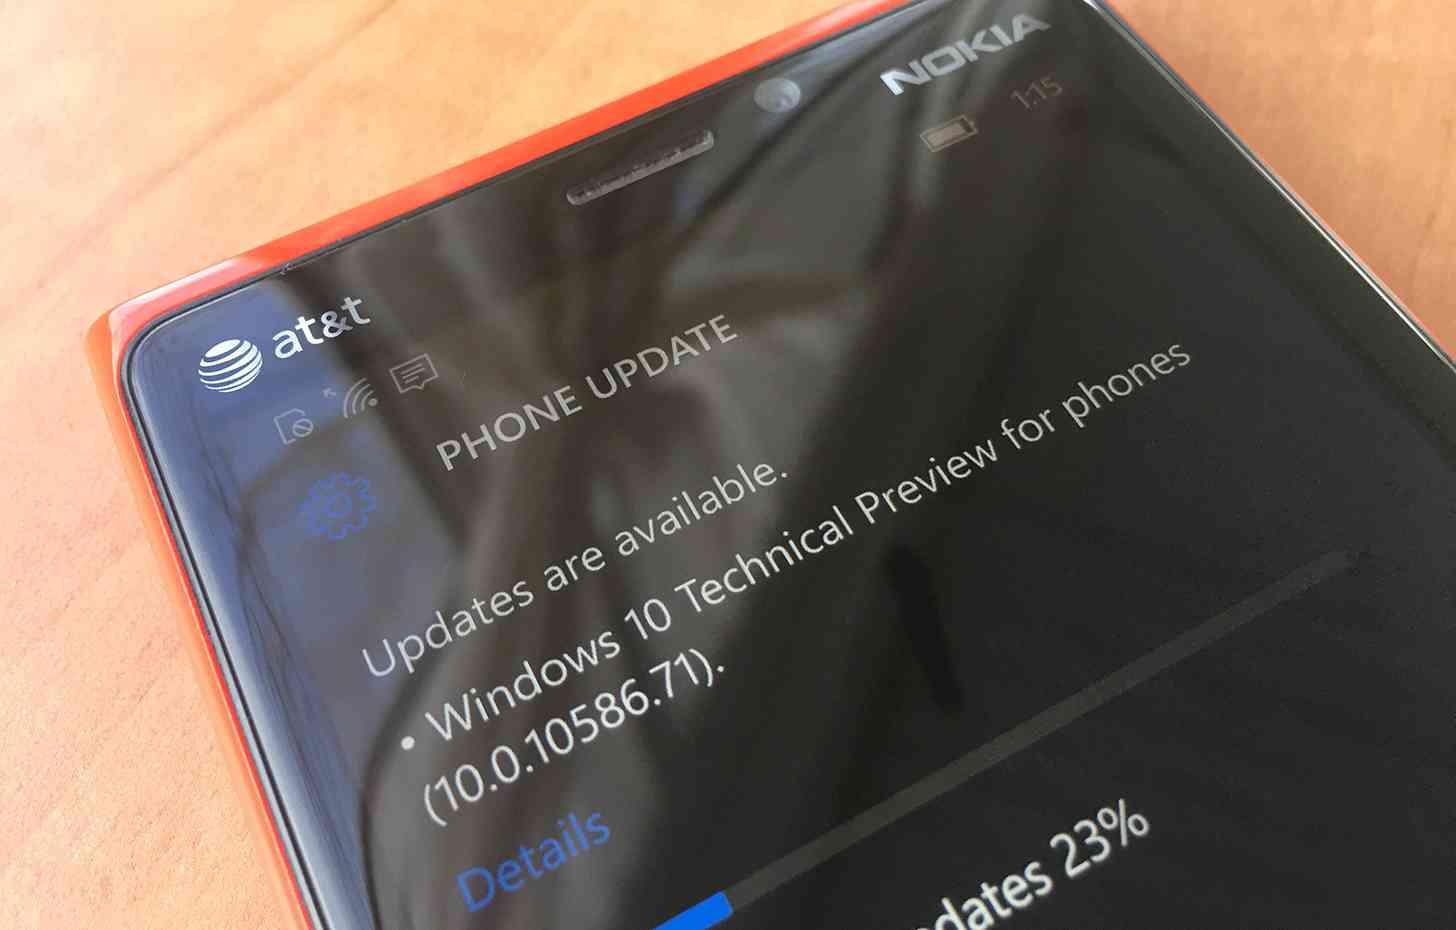 Windows 10 Mobile build 10586.71 update